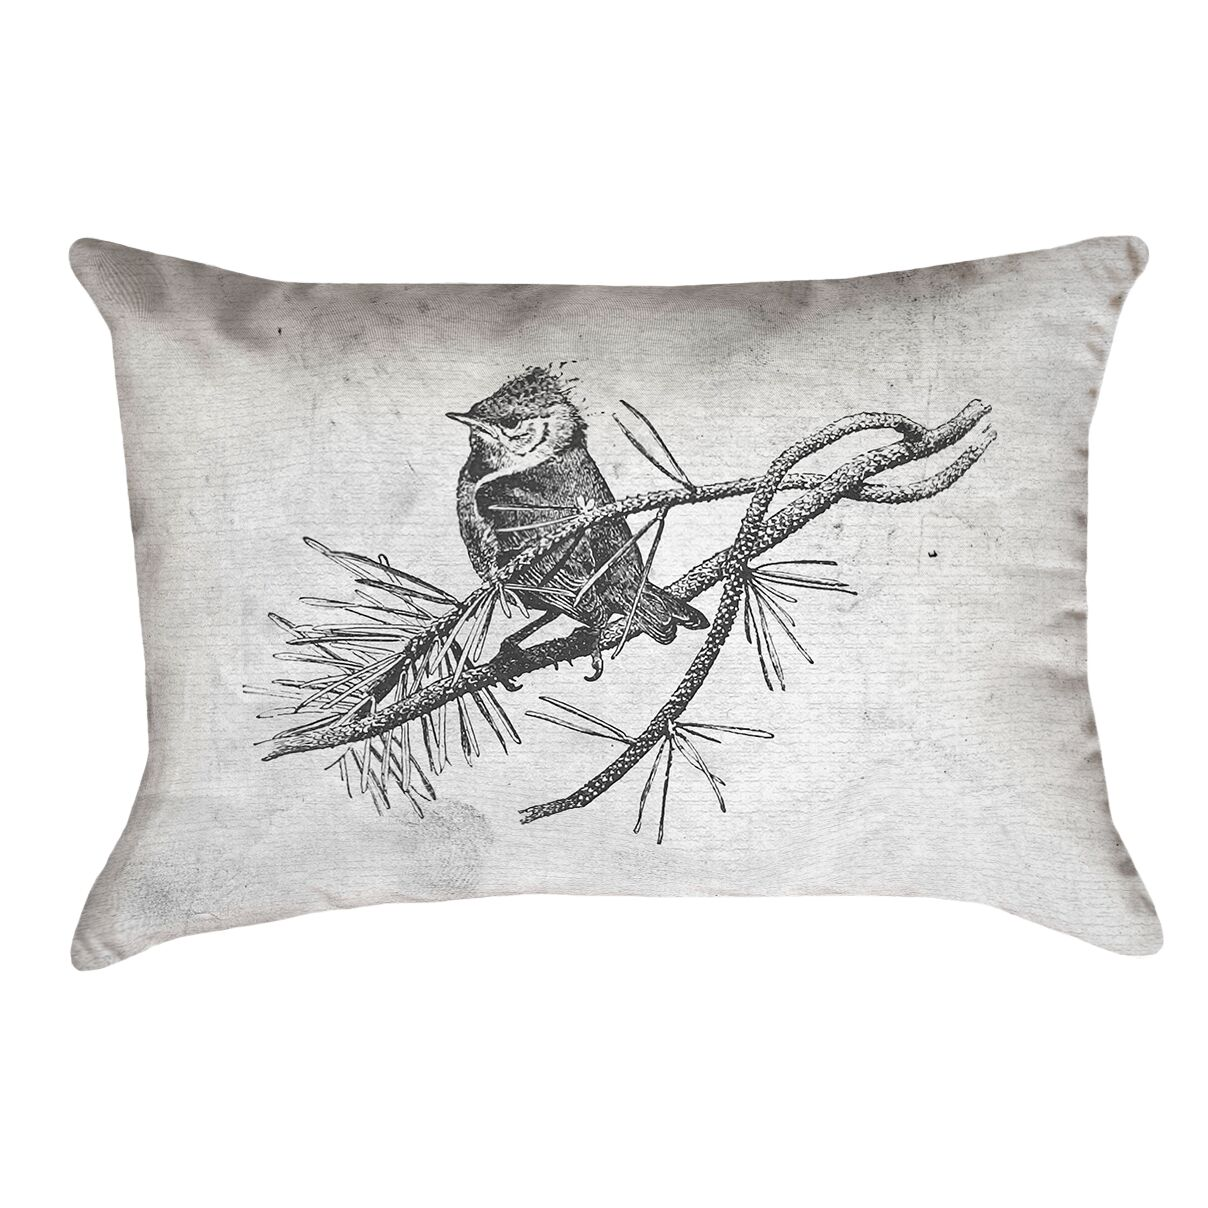 Venezia Vintage Bird Double Sided Lumbar Pillow